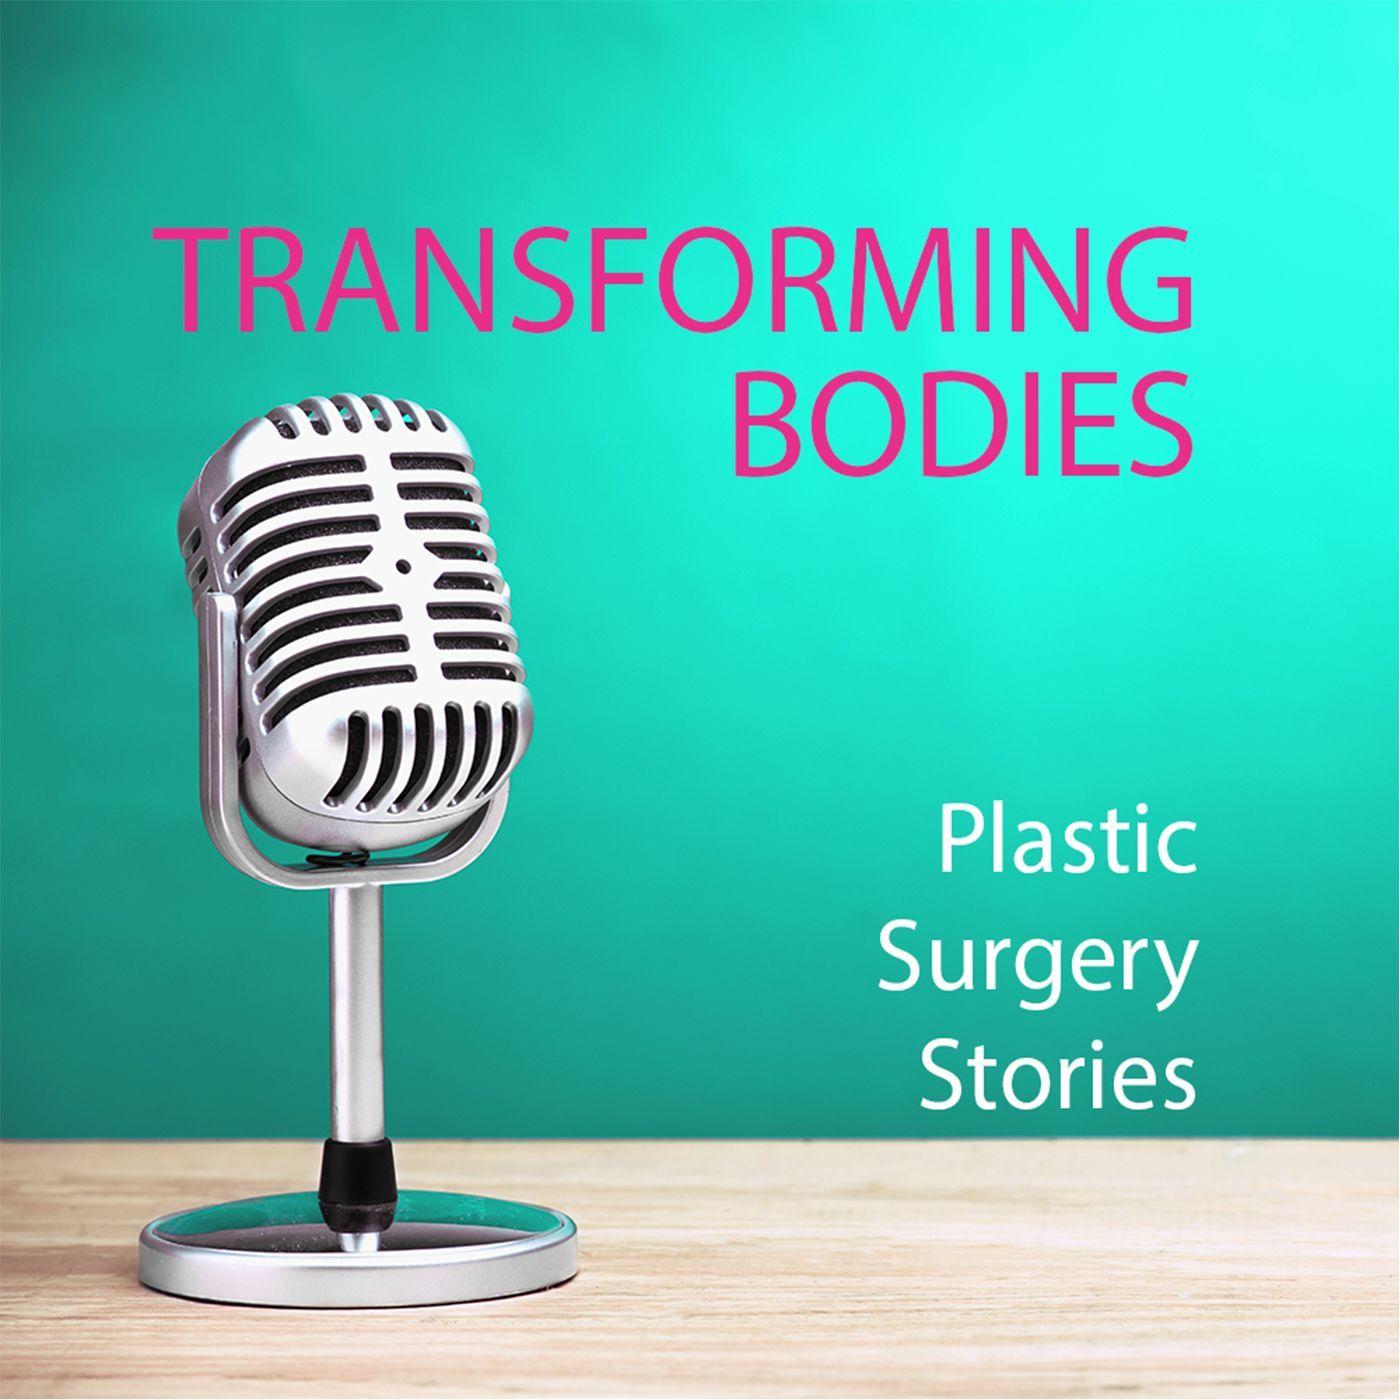 Transforming Bodies Plastic Surgery Stories - Whooshkaa